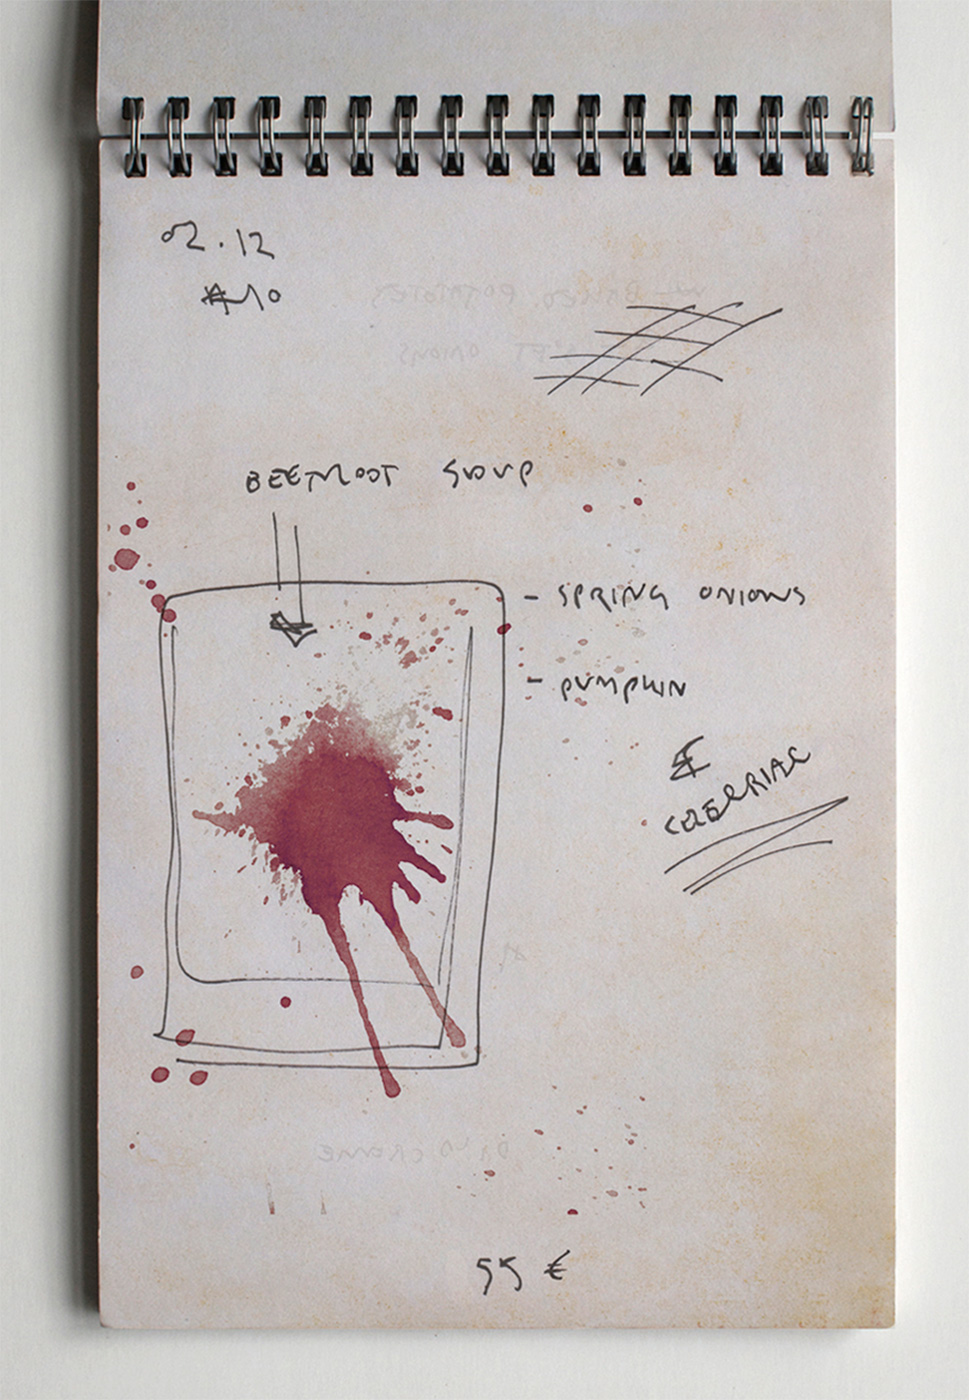 menu_card_design_artist_kunstner_graphic_designer_grafisk_designer_marie_broegger_layout_typografi_typography-4